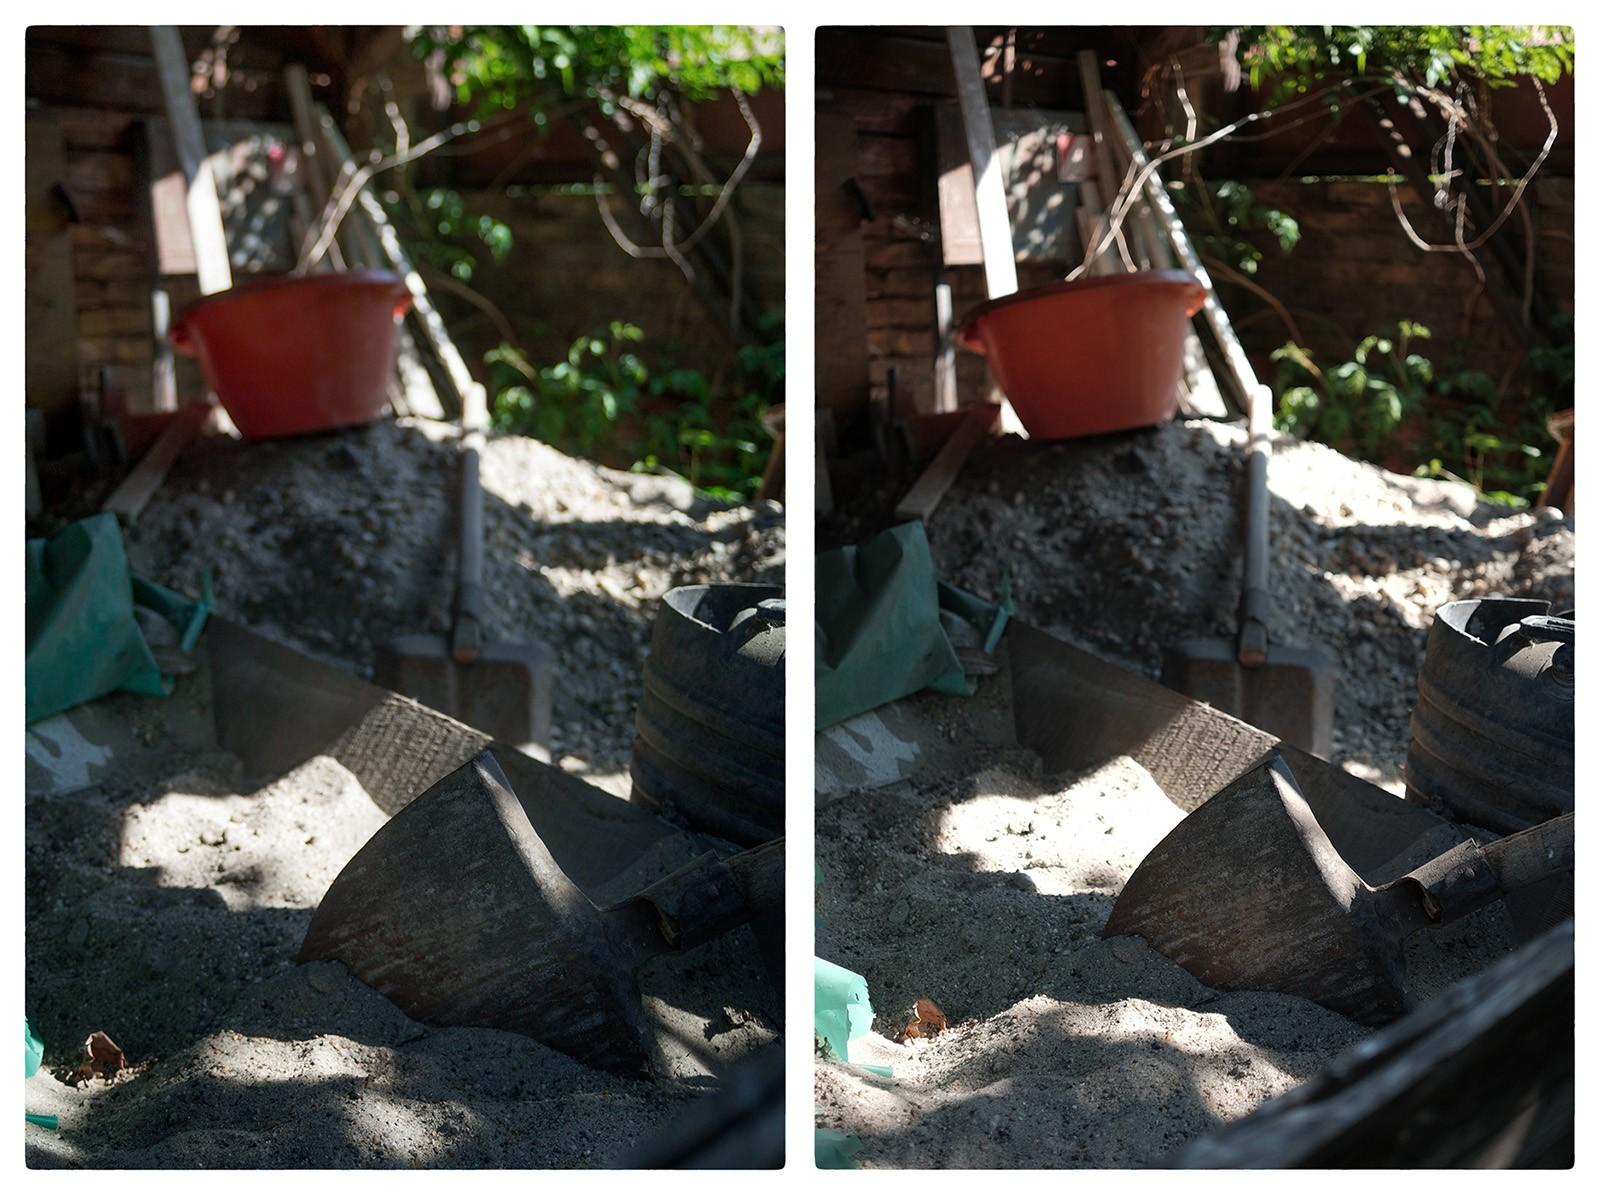 PICTOGRAMAX - 2020 - 05 07 - XE2 VS G3.jpg